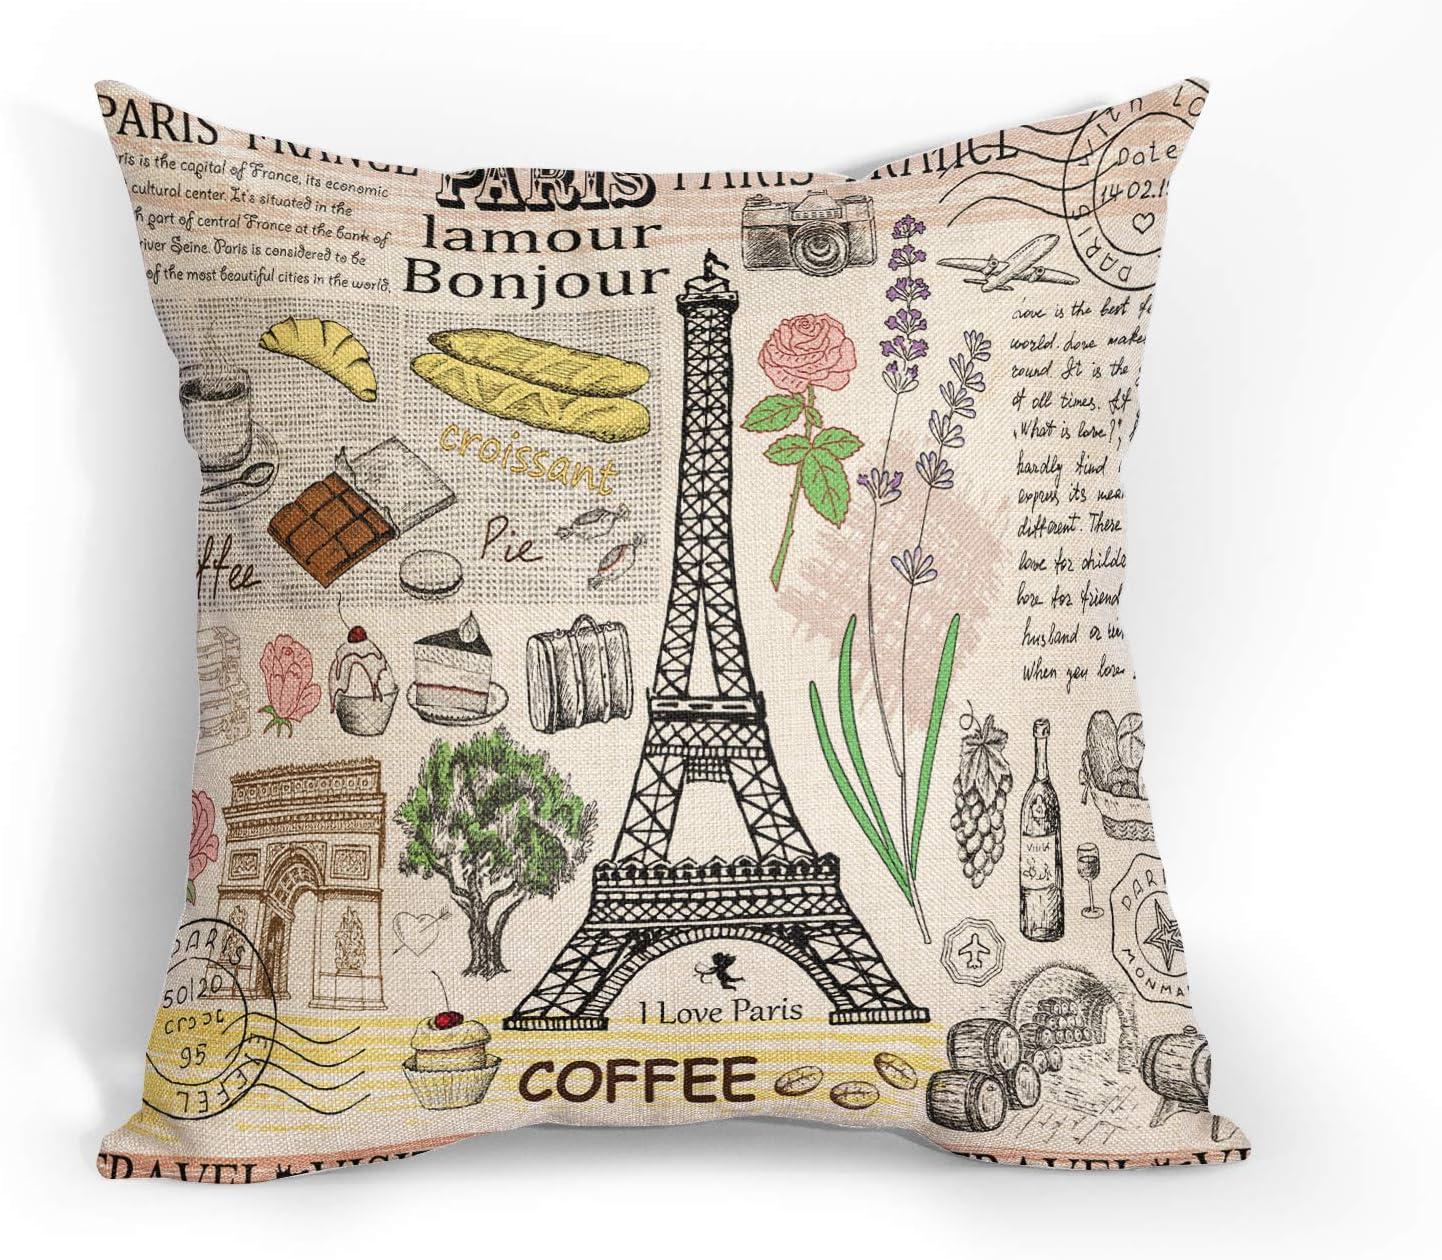 DZGlobal Eiffel Tower Throw Pillows Cover Paris Pillow Case Decoration Home Decor Cushion Case Farmhouse and Sofa Couch Cotton Linen 18